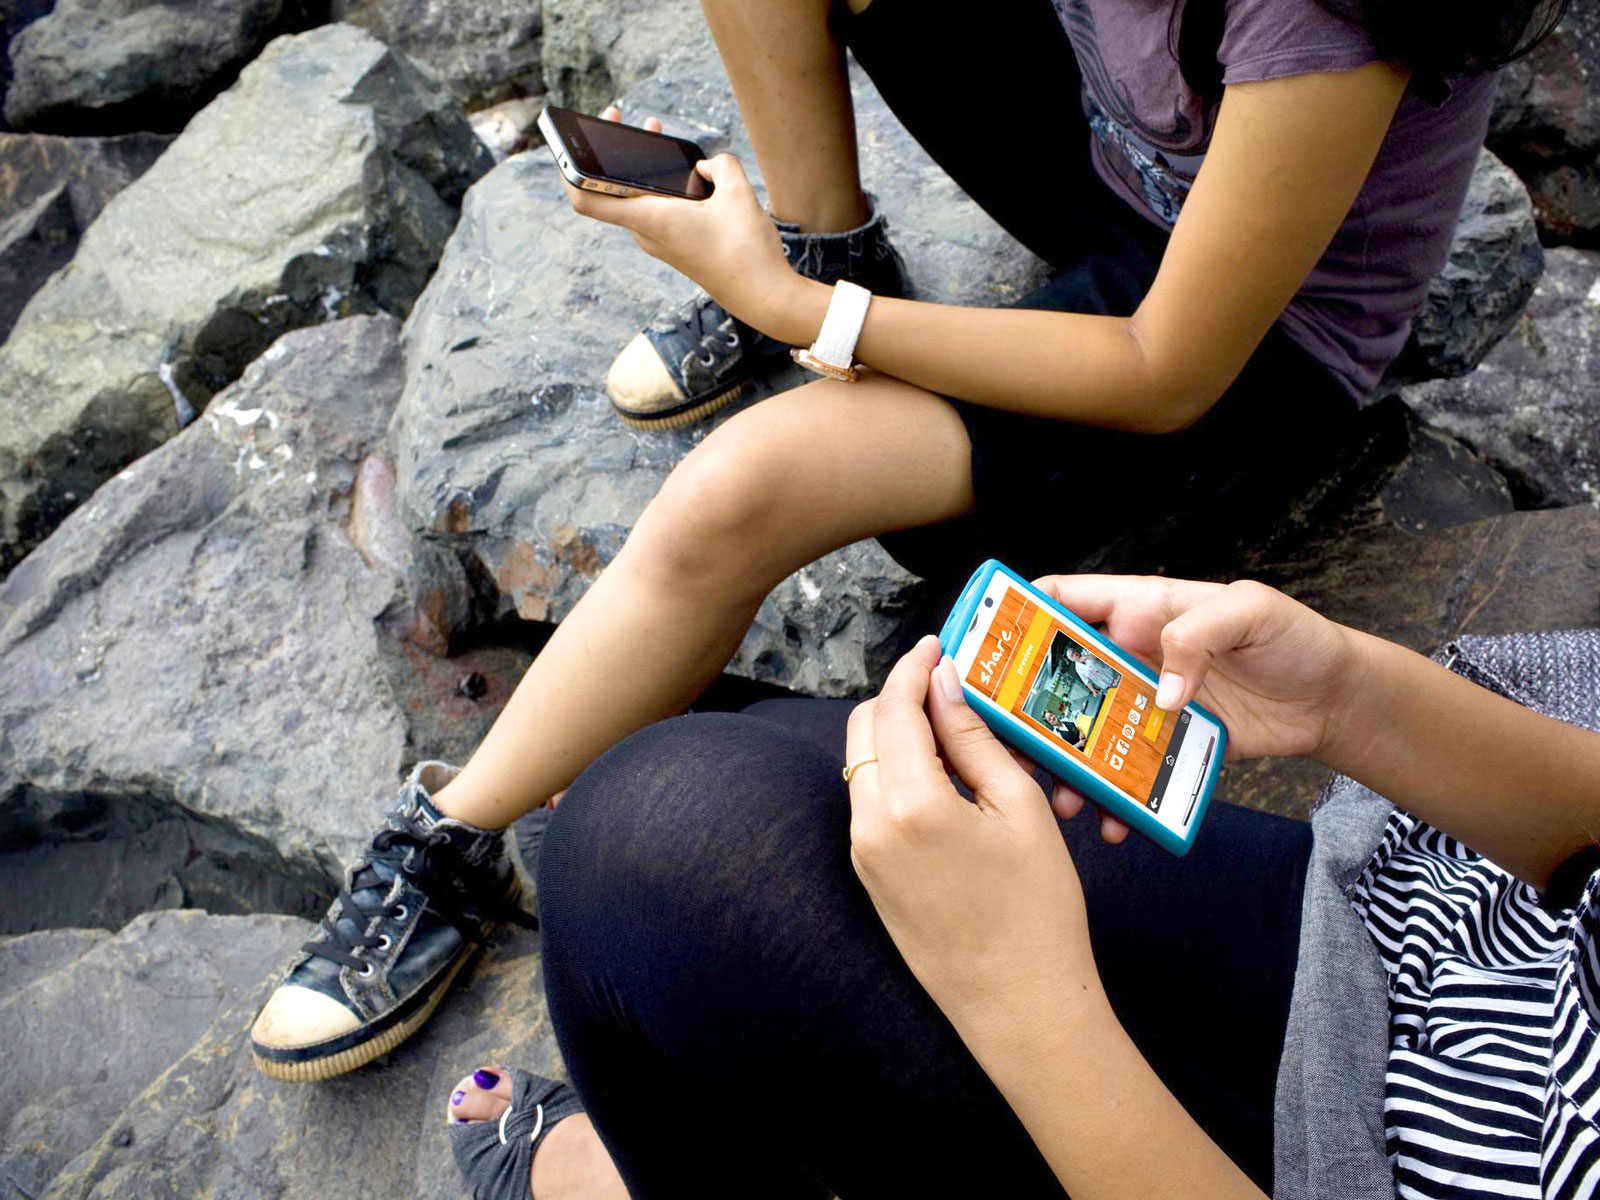 students-holding-smartphone-by-Kainaz-Amaria_1600x1200.jpg